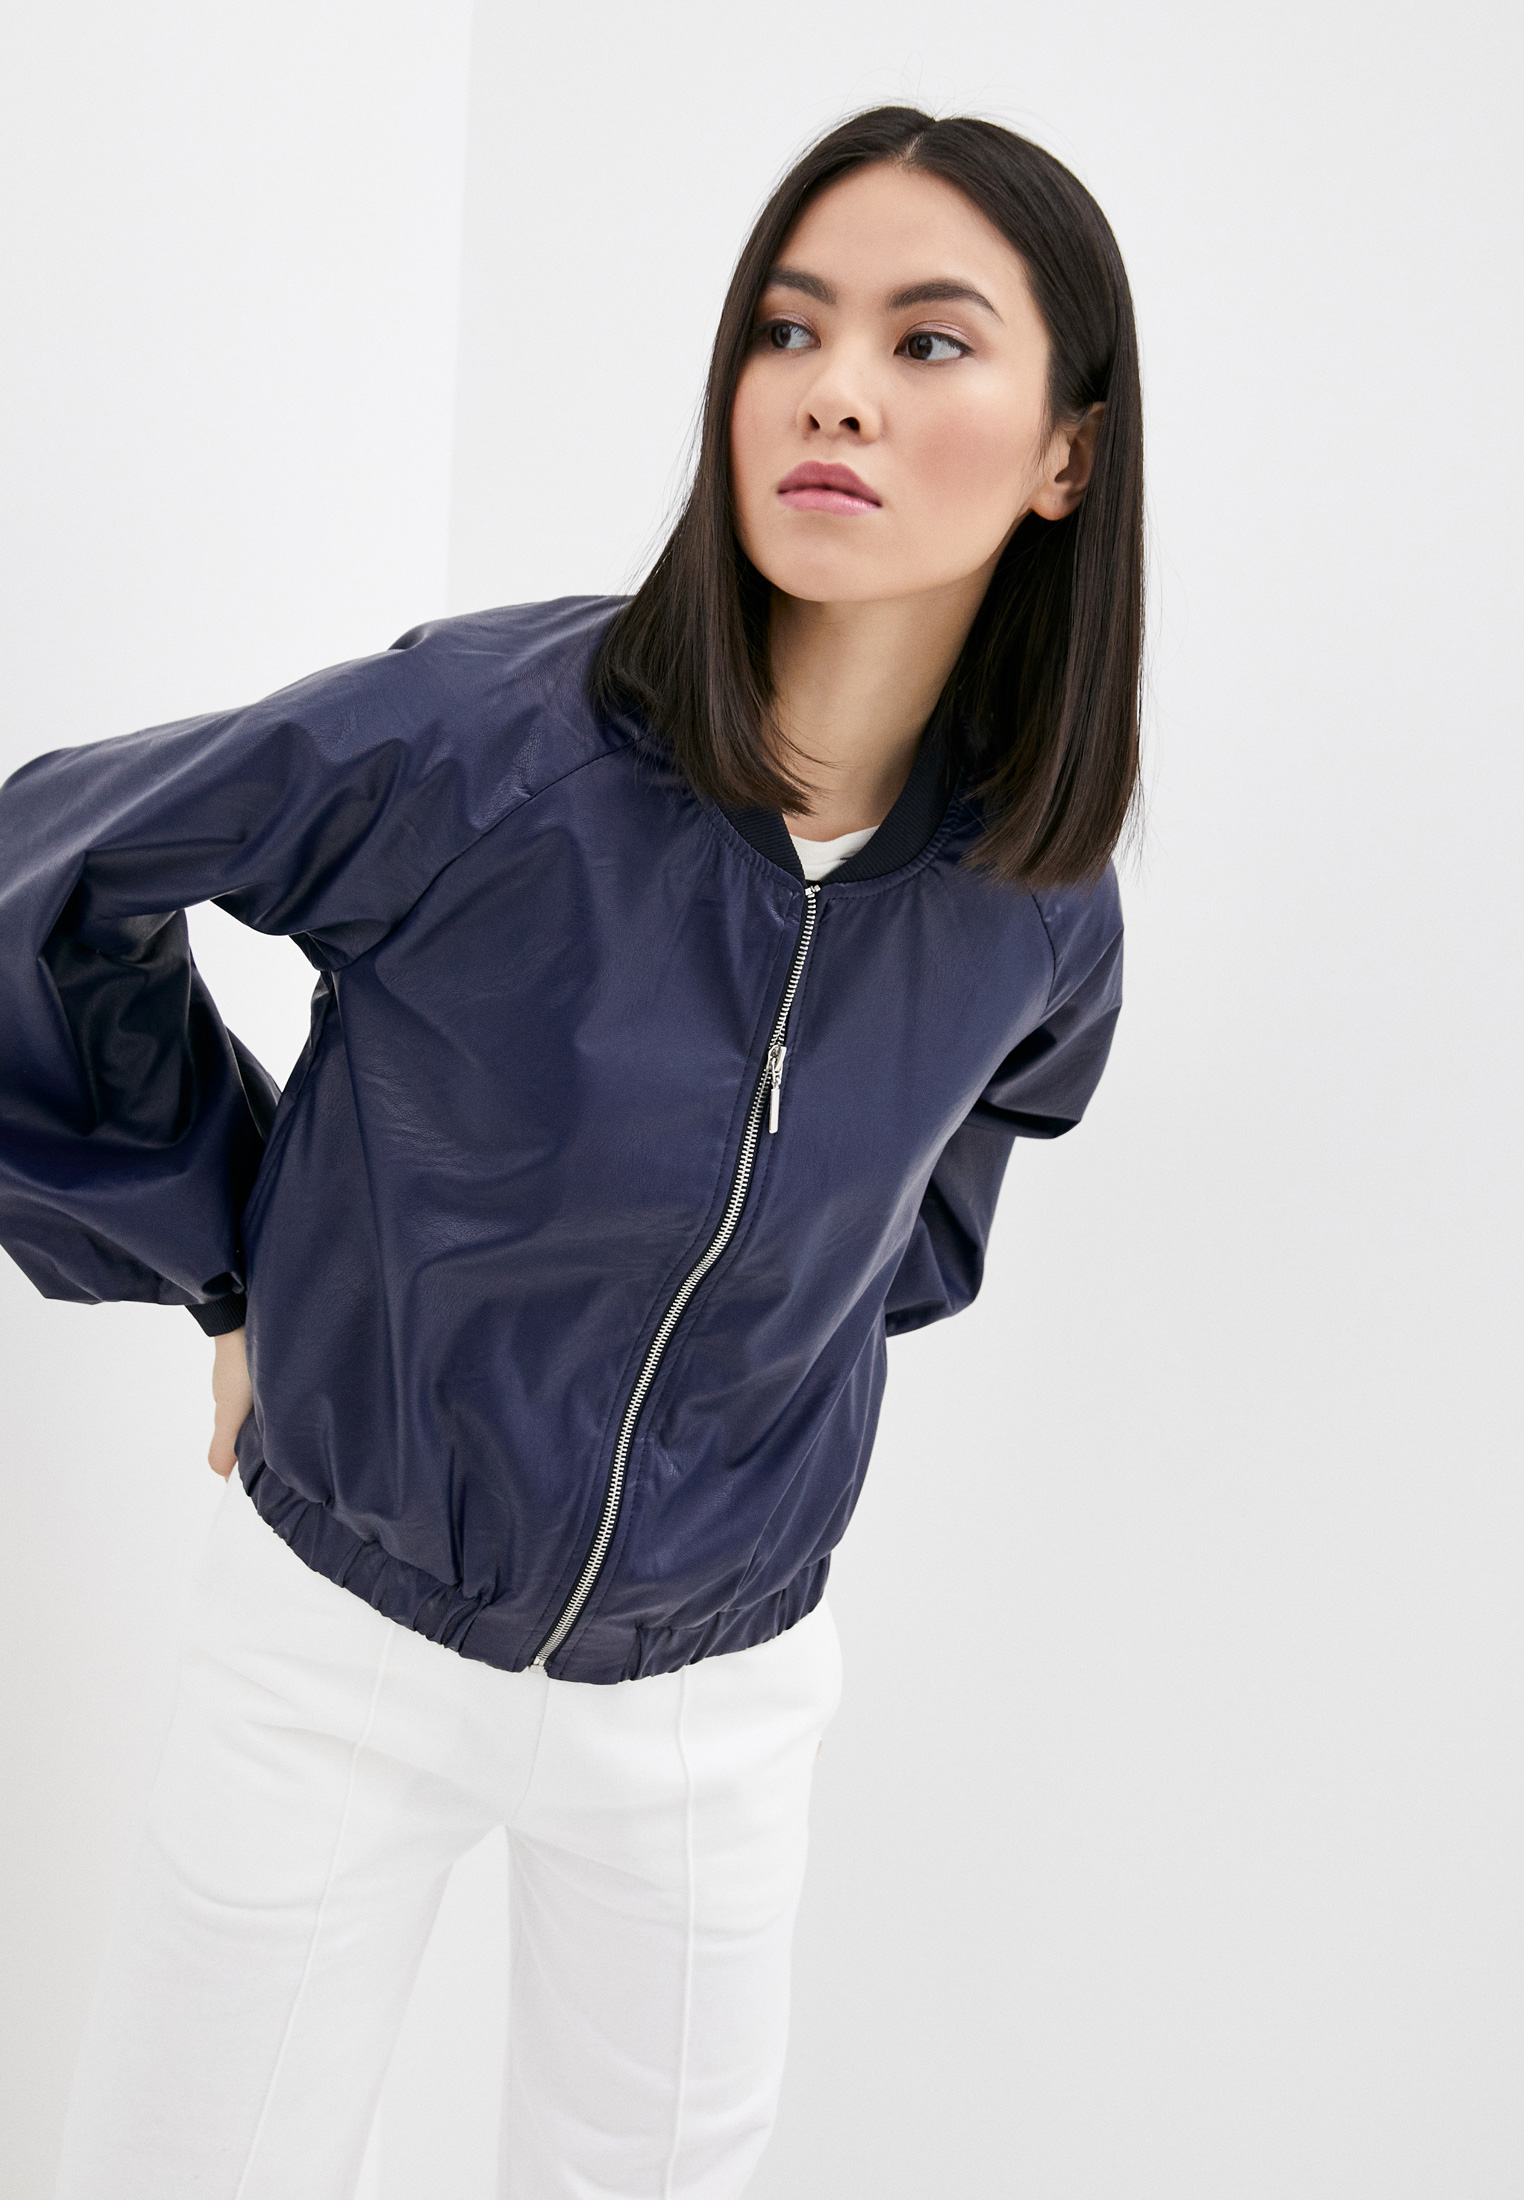 Кожаная куртка Rinascimento Куртка кожаная Rinascimento